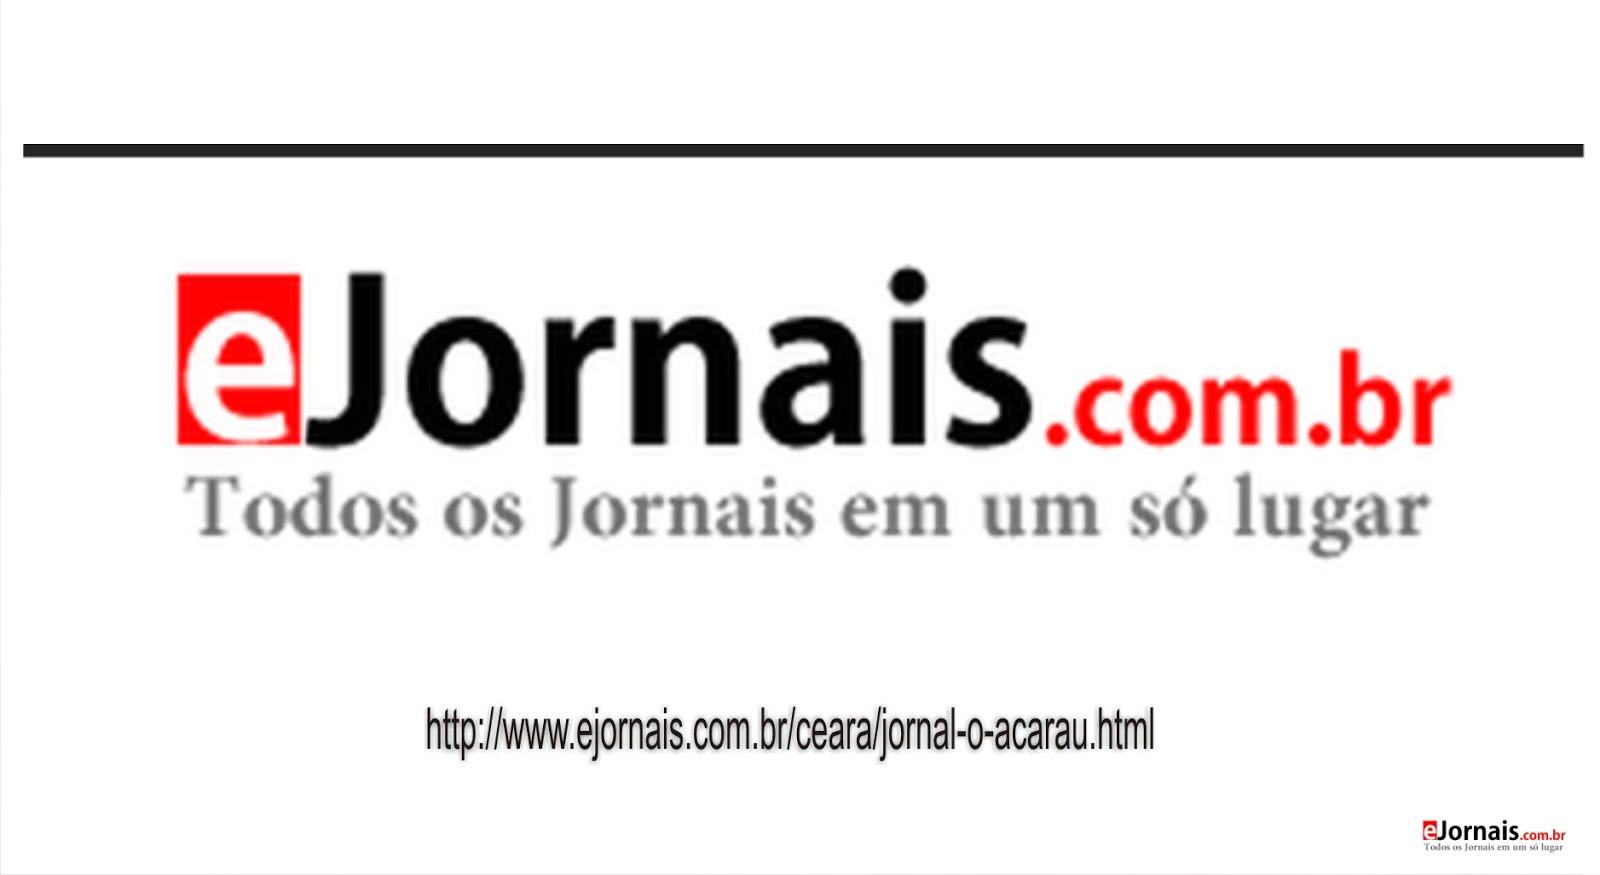 eJornais